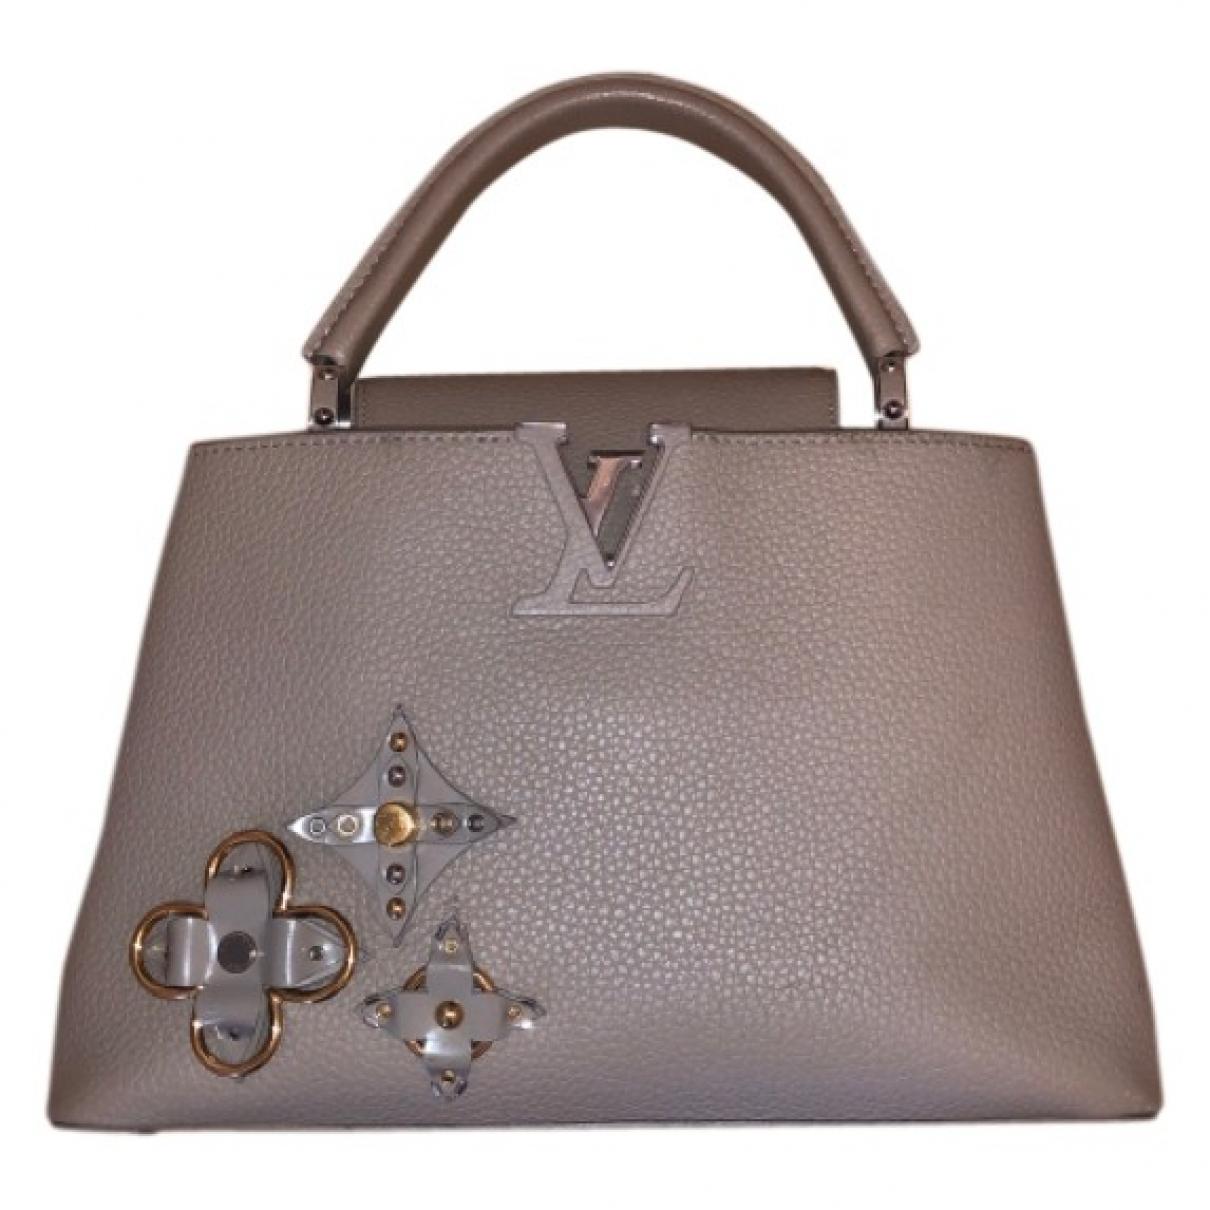 Louis Vuitton Capucines Beige Leather handbag for Women \N